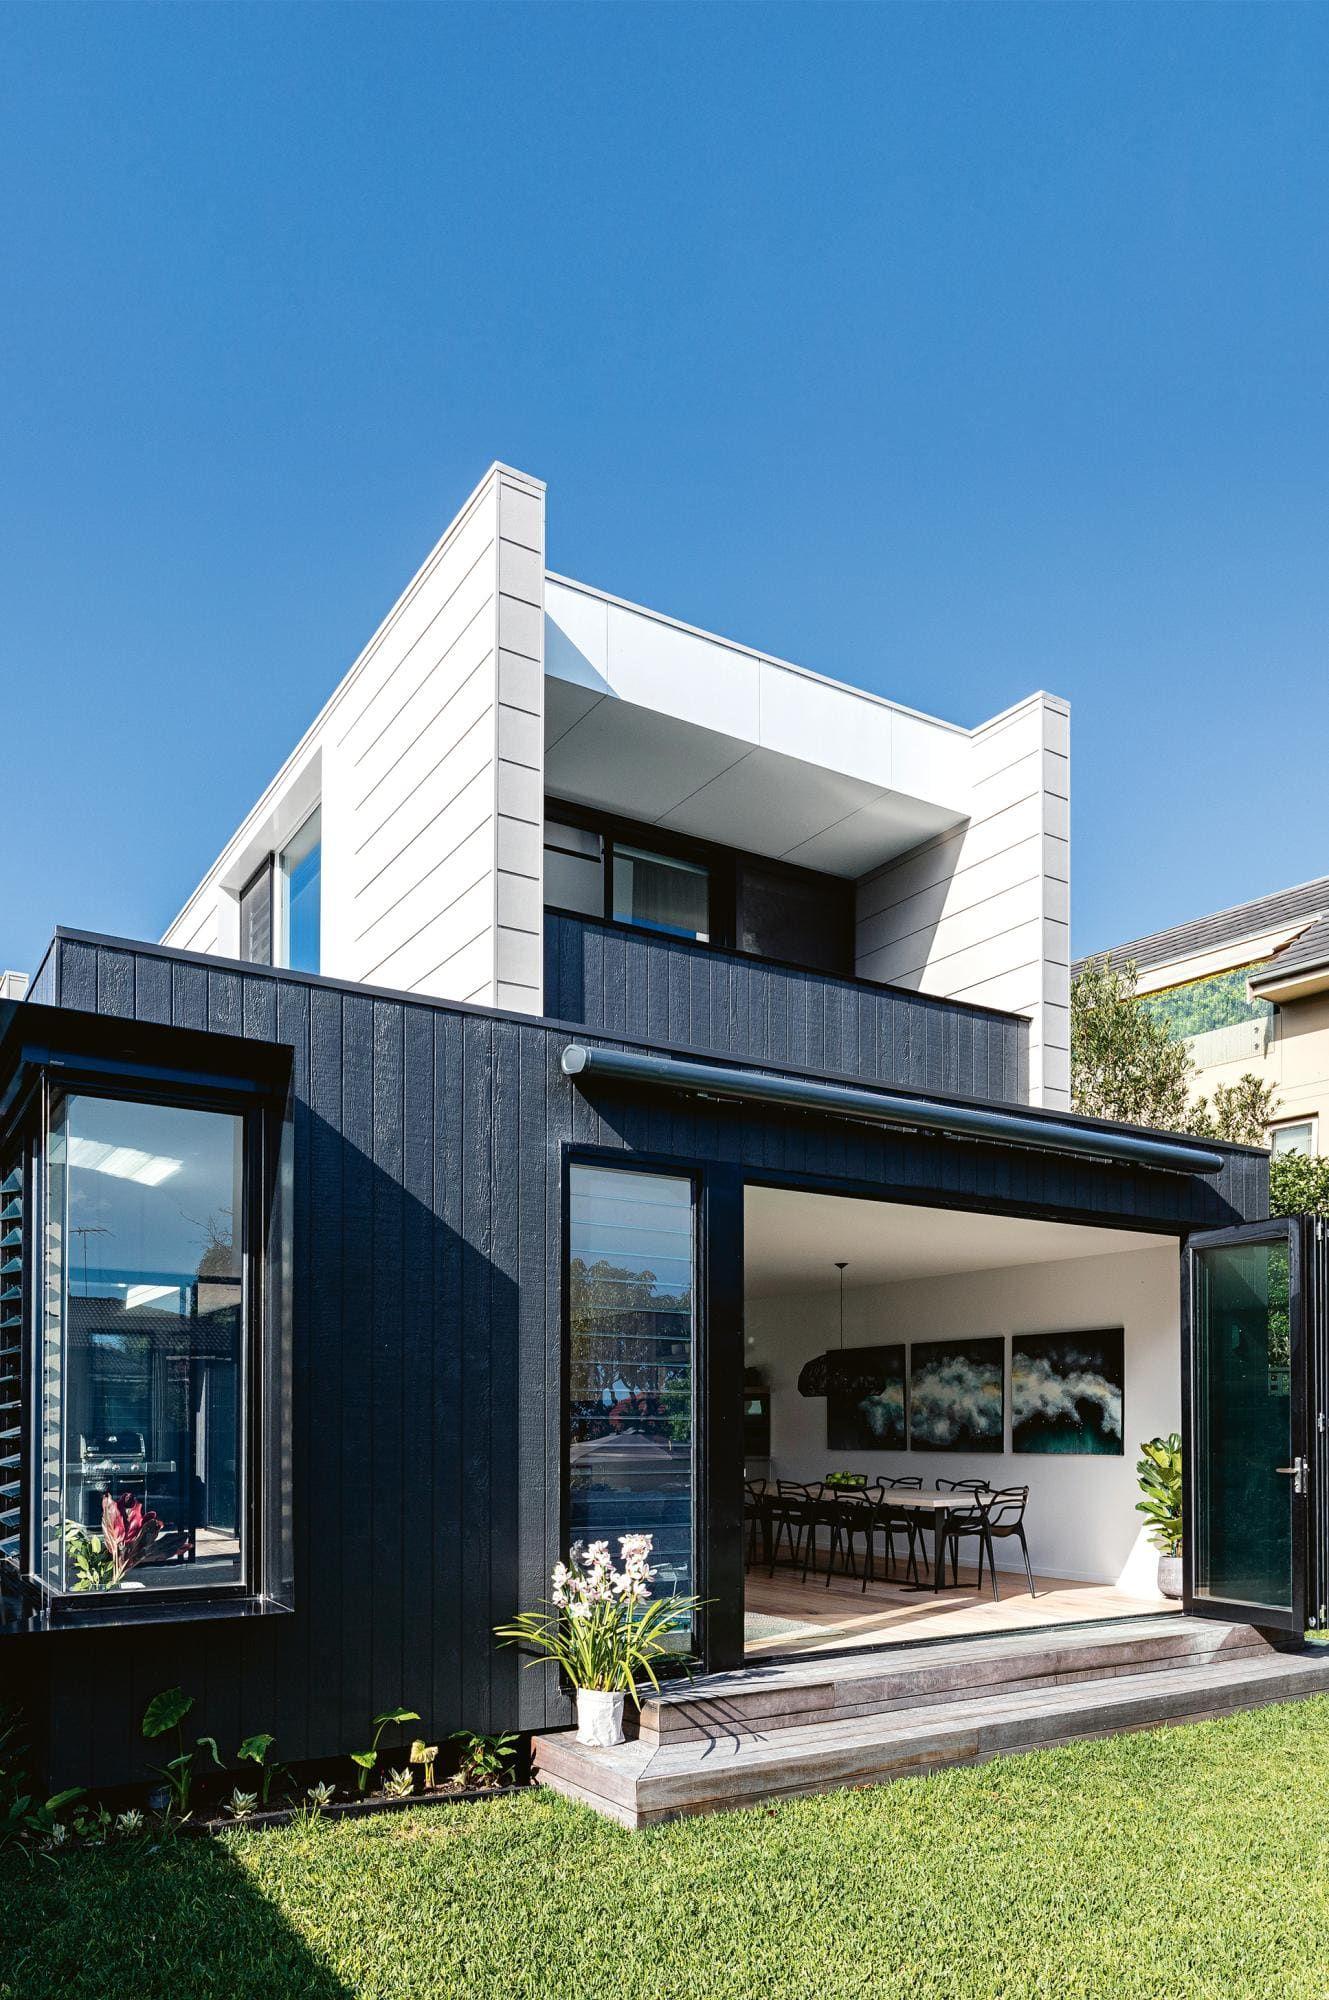 Inspiring Ideas From A Uniquely Designed Modular Home Prefabricated Houses Prefab Homes House Exterior